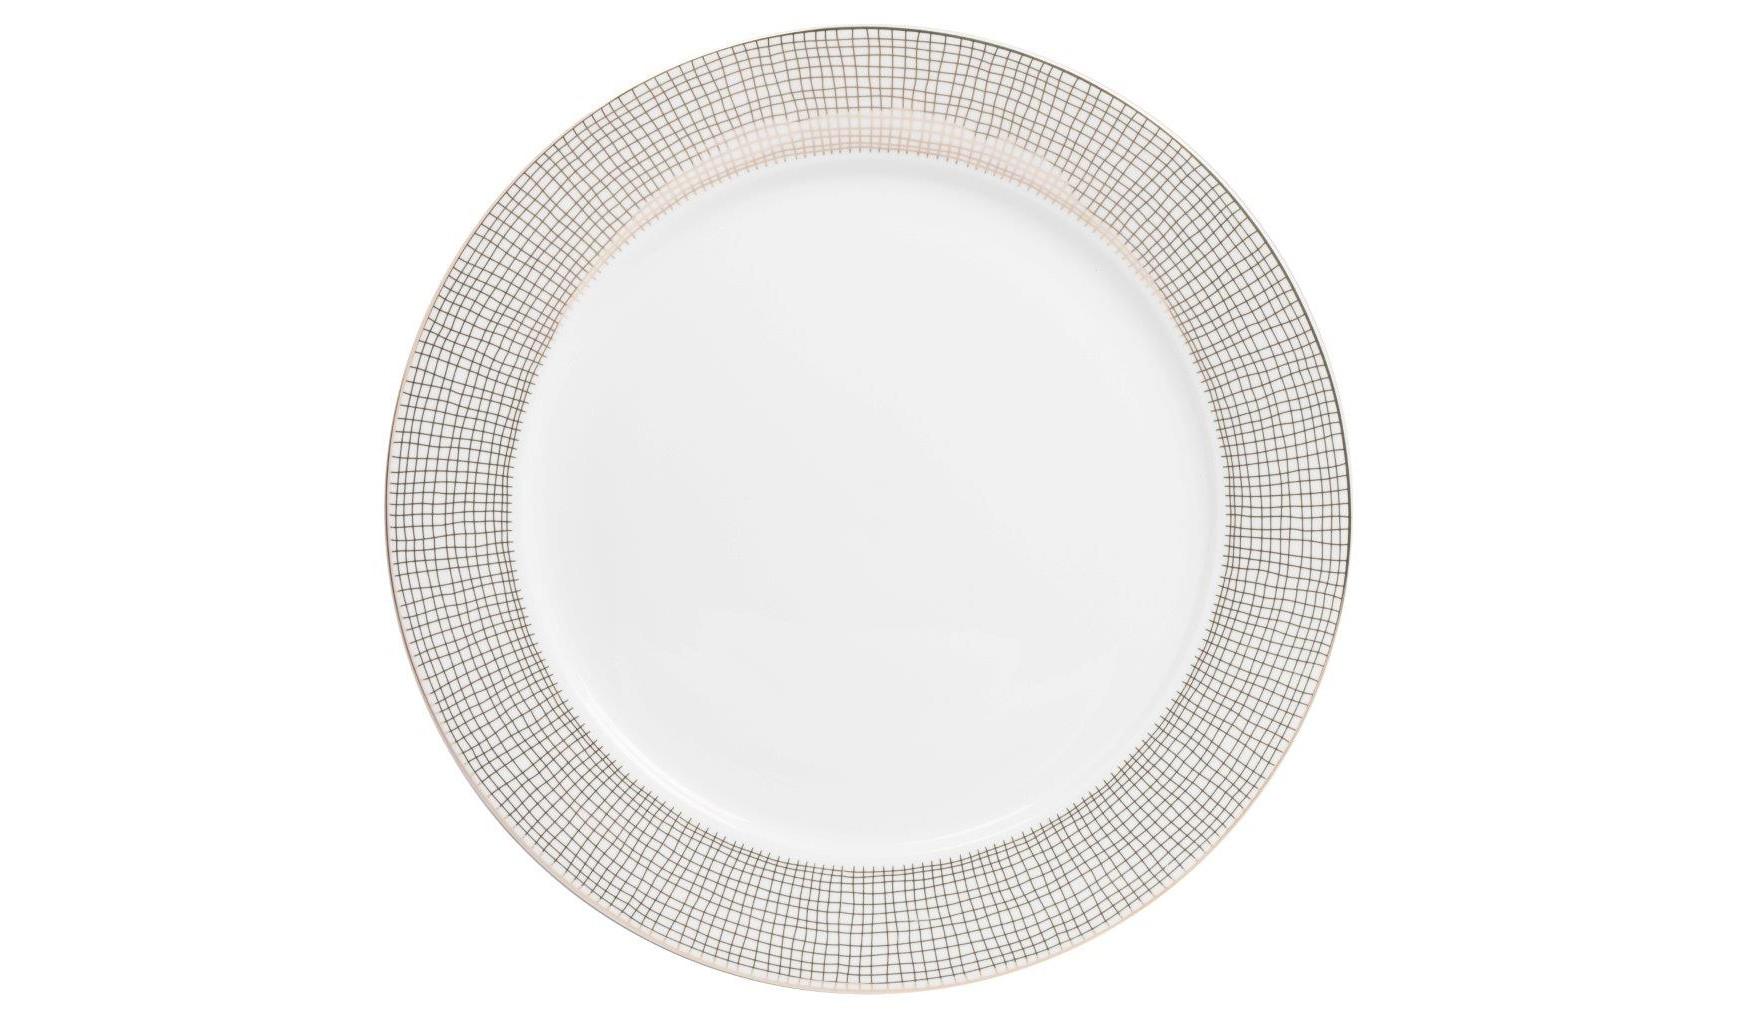 Блюдо JardinДекоративные блюда<br><br><br>Material: Фарфор<br>Diameter см: 30,5